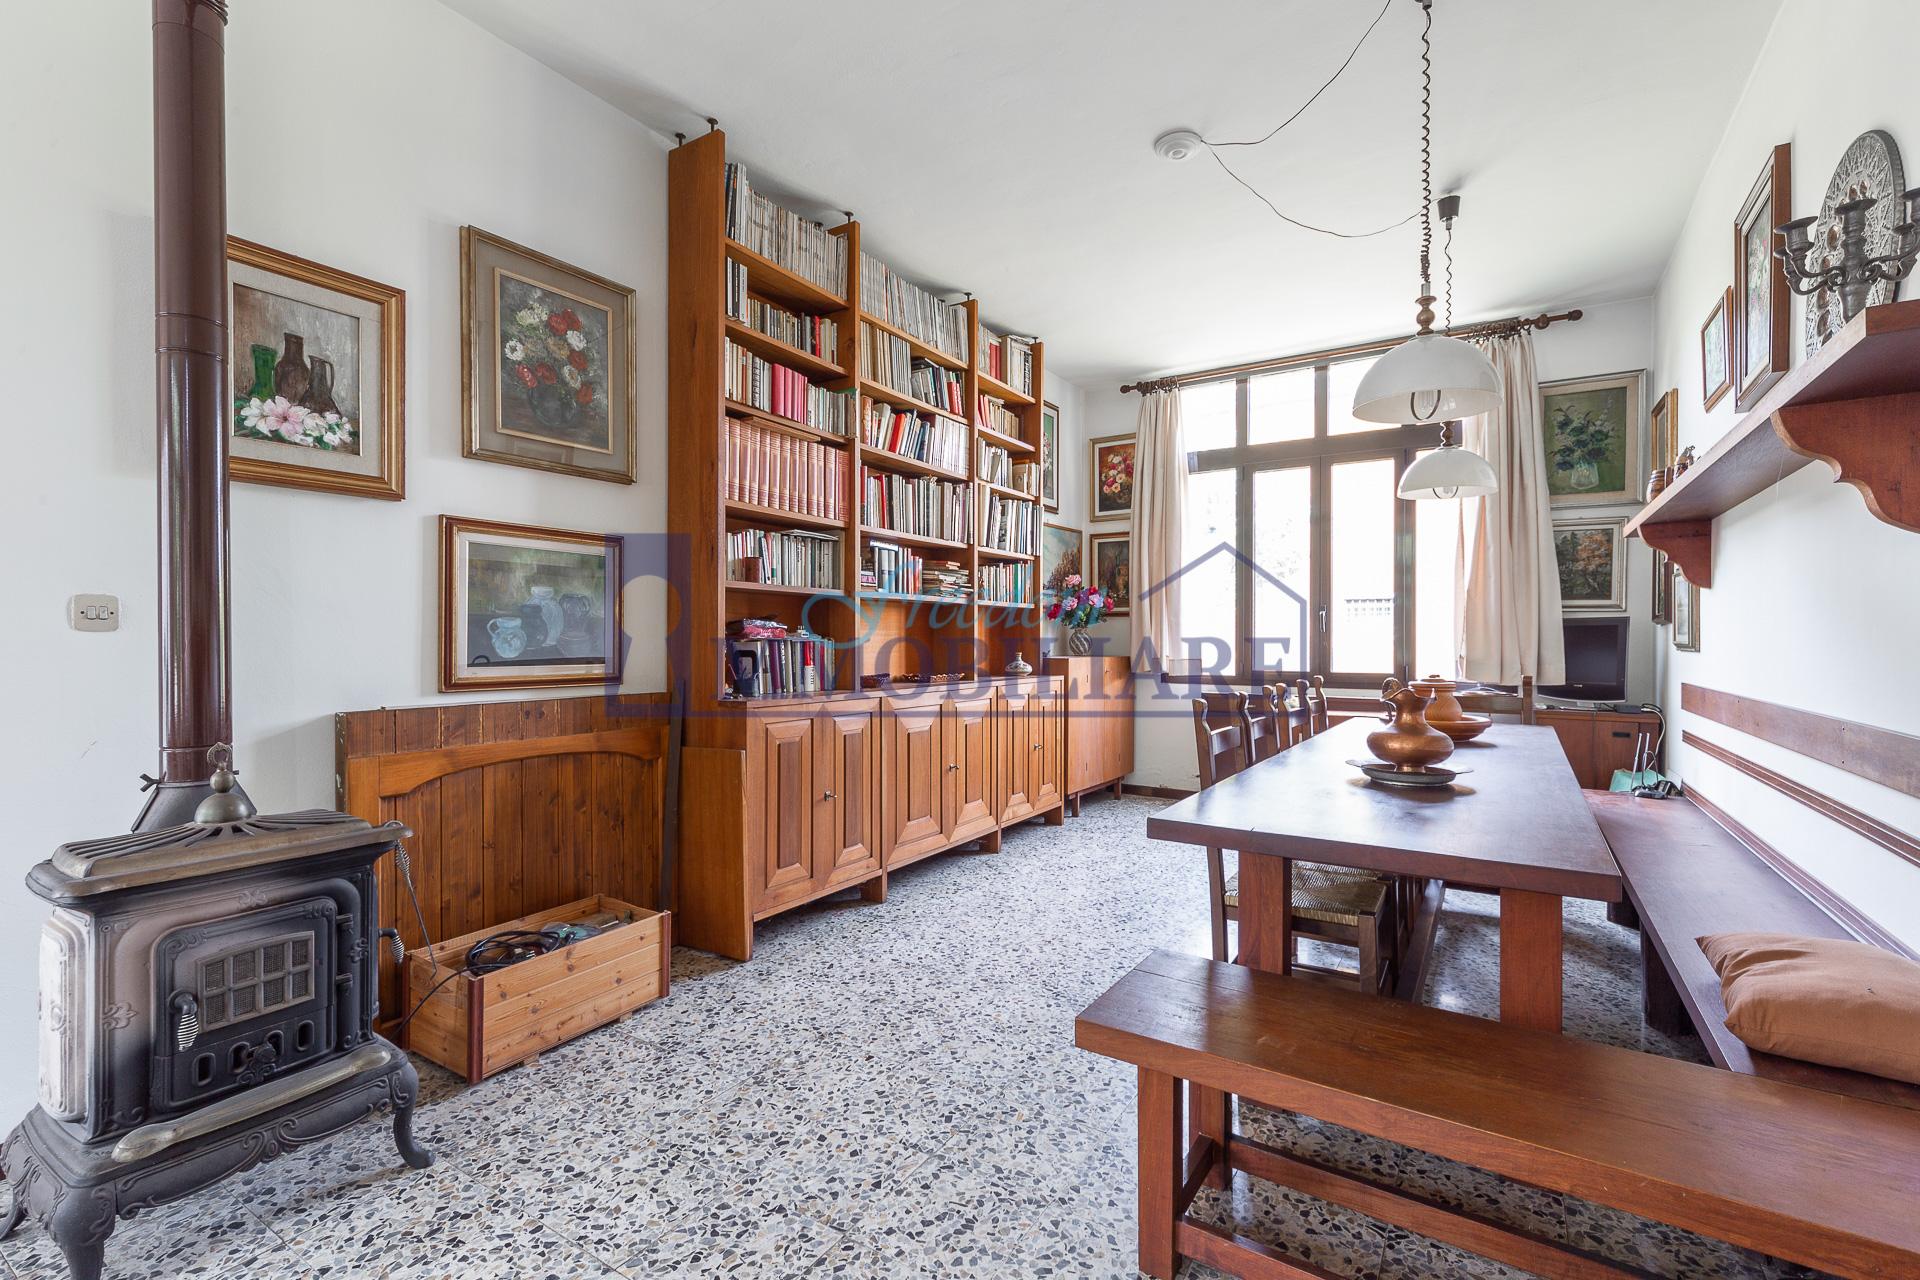 Villa unifamiliare via Cesare Pascarella 10, San Giuliano Milanese